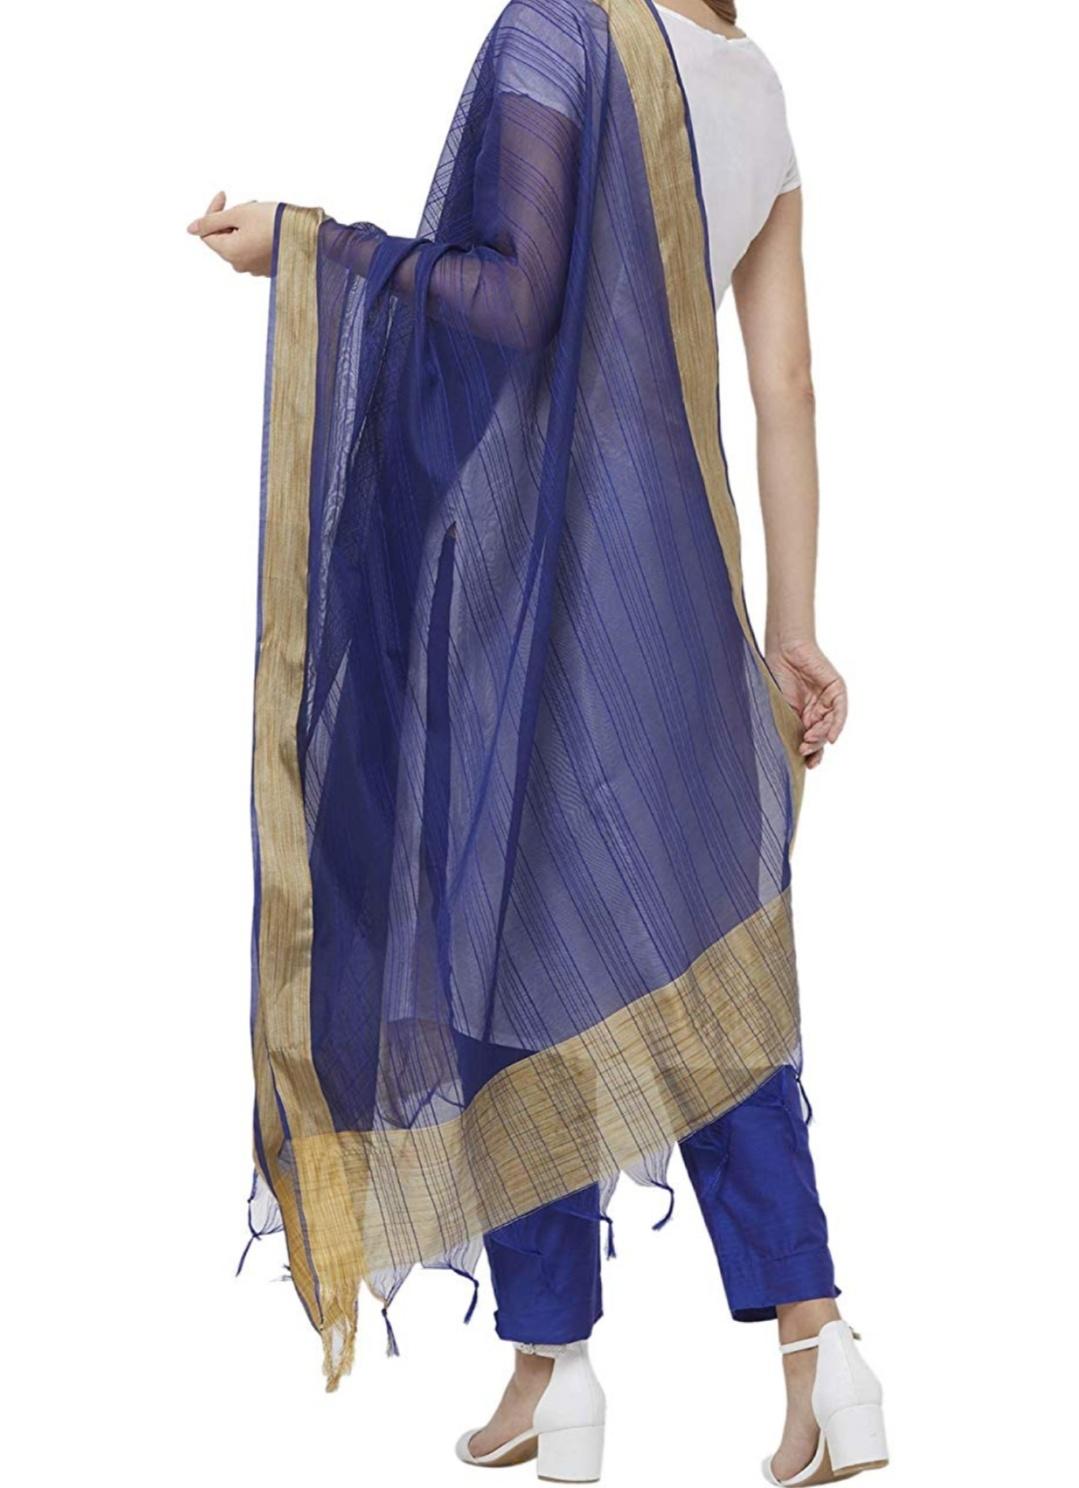 Samridhi Collections Plain Gold Borderd With Tassels Art Silk Dupatta For Women & Girls (Royal Blue)